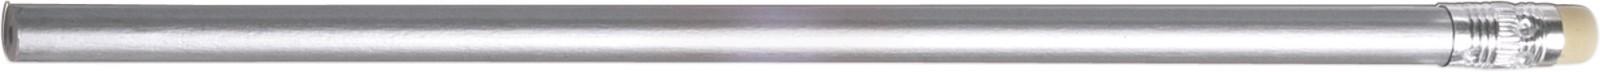 Lápiz HB de madera - Silver